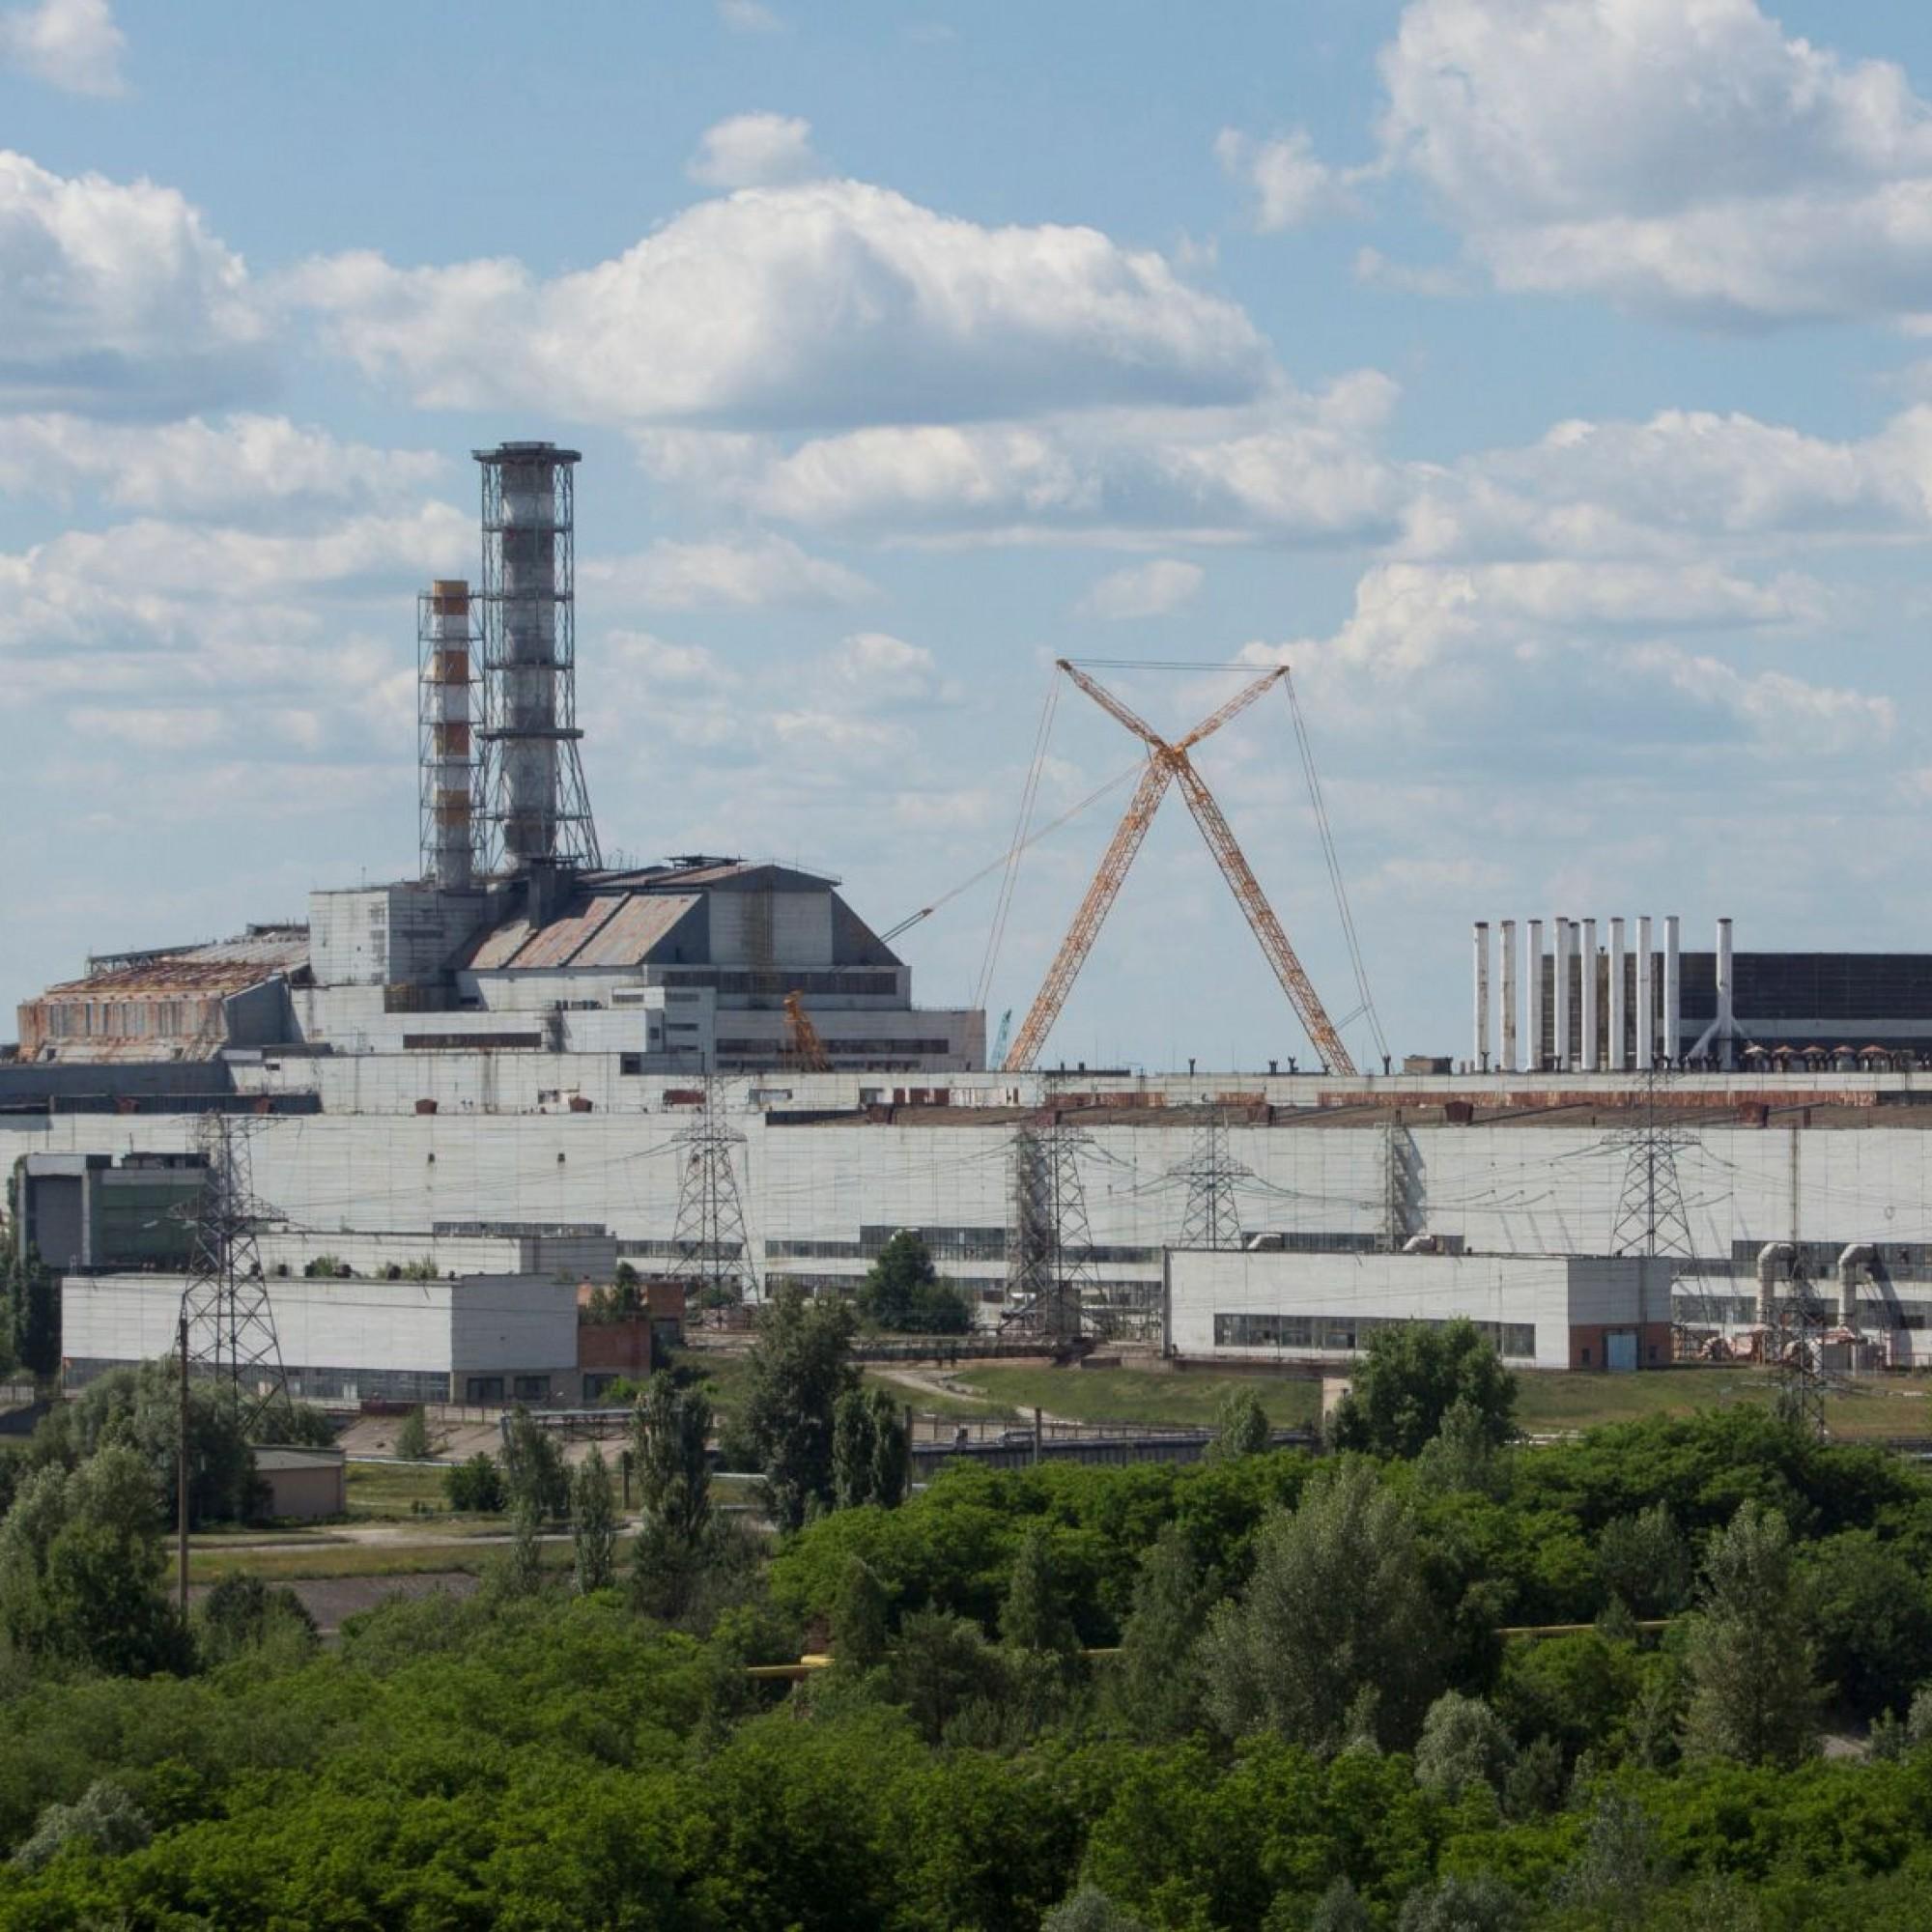 Atomkraftwerk prypjat